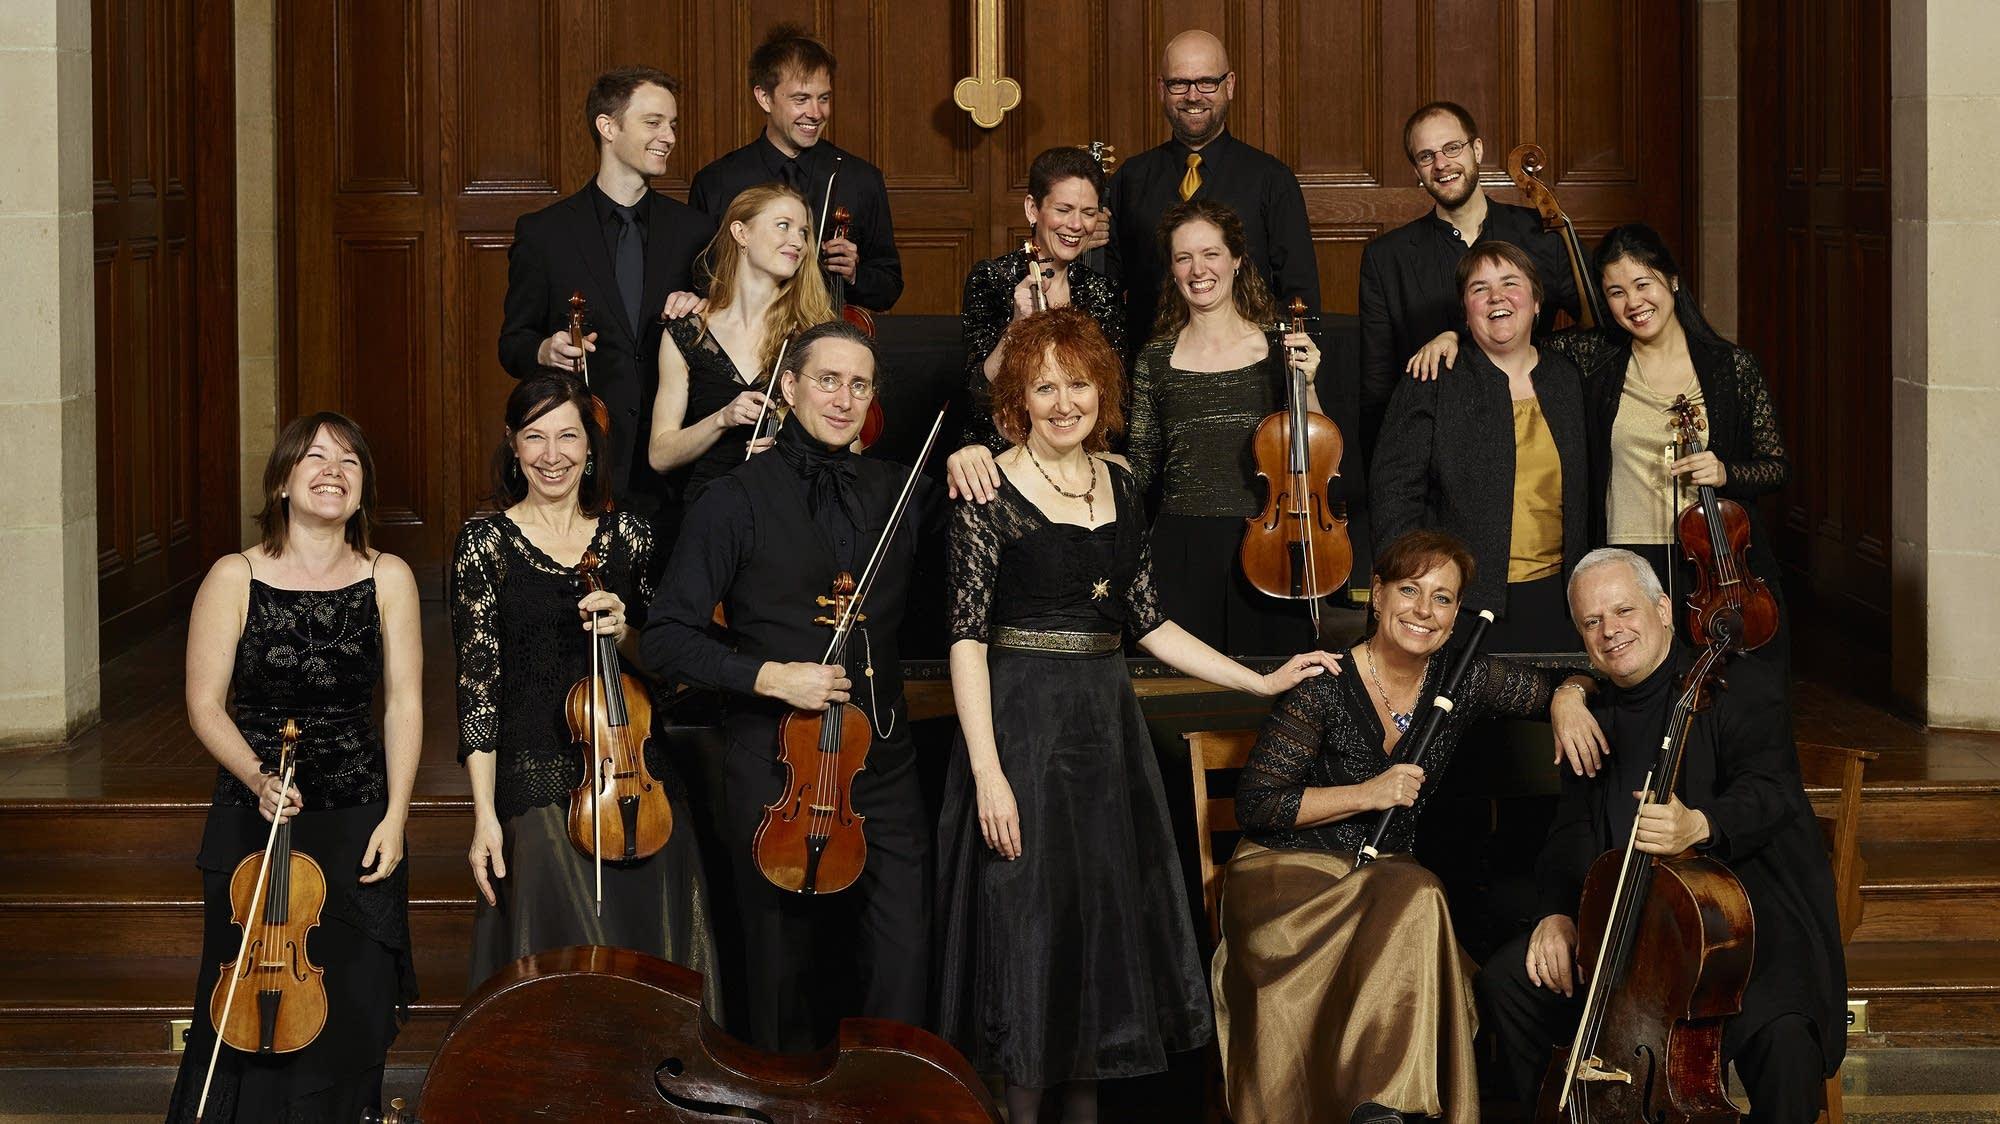 Members of the baroque orchestra, Apollo's Fire.